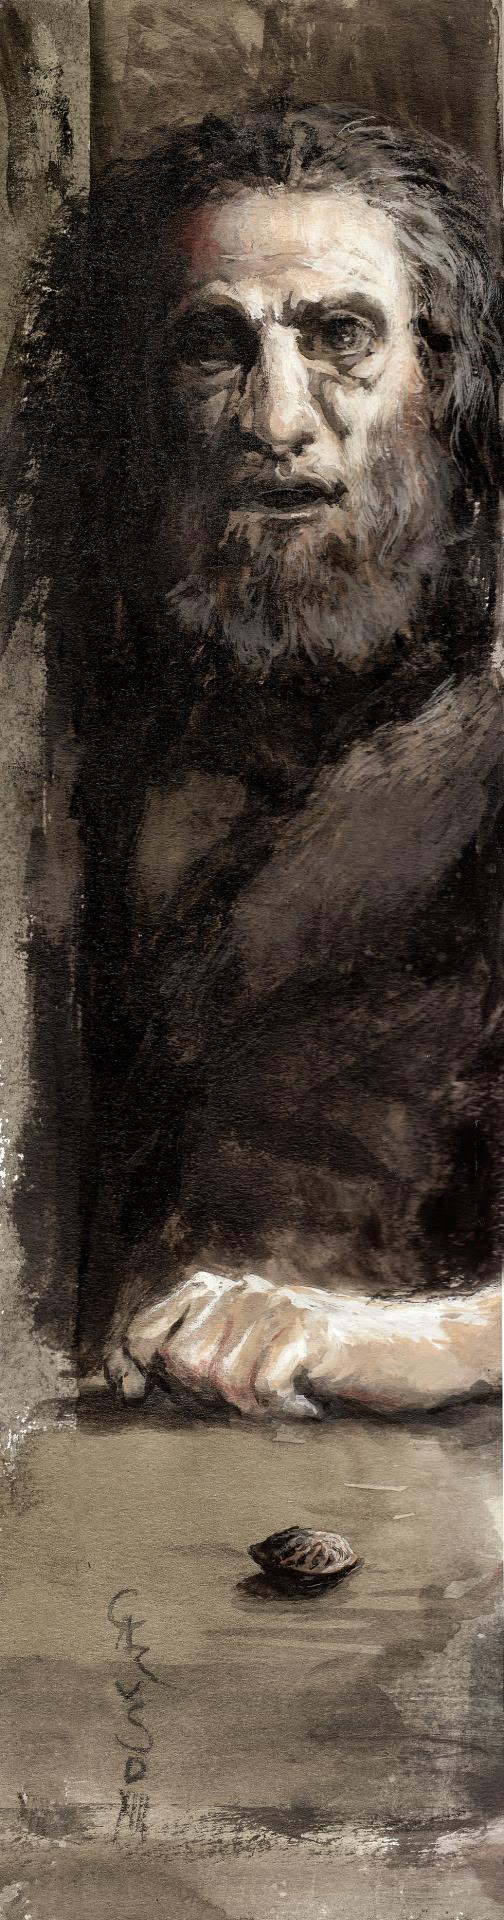 "Santiago Caruso / Study in gouache and tempera for ""La Tentation de Saint Antoine"" / 8cm x 31,5cm"